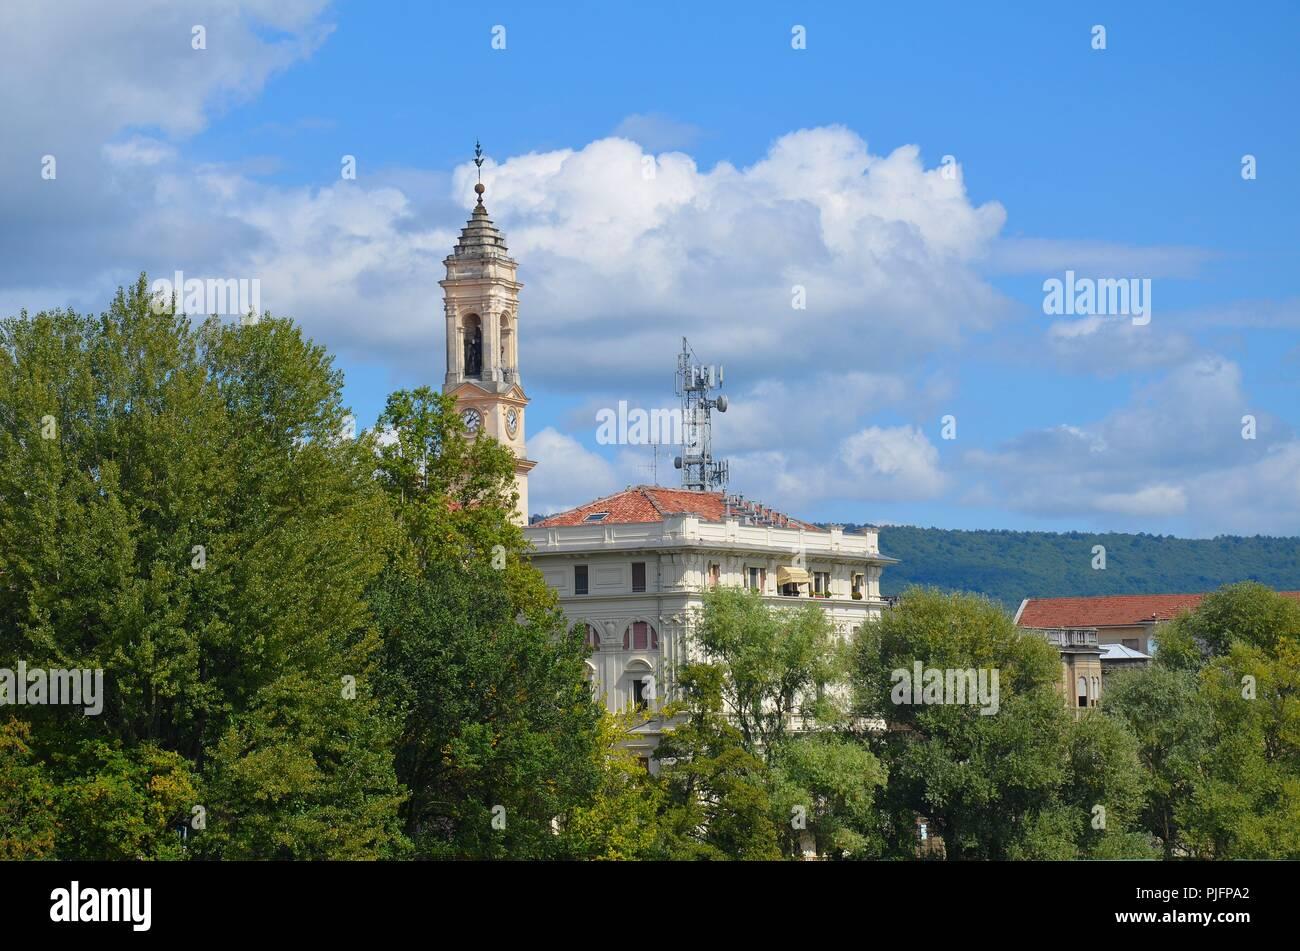 Ivrea (Provinz Piemont) am Fluss Dora Baltea, Italien: Der Rathausturm - Stock Image